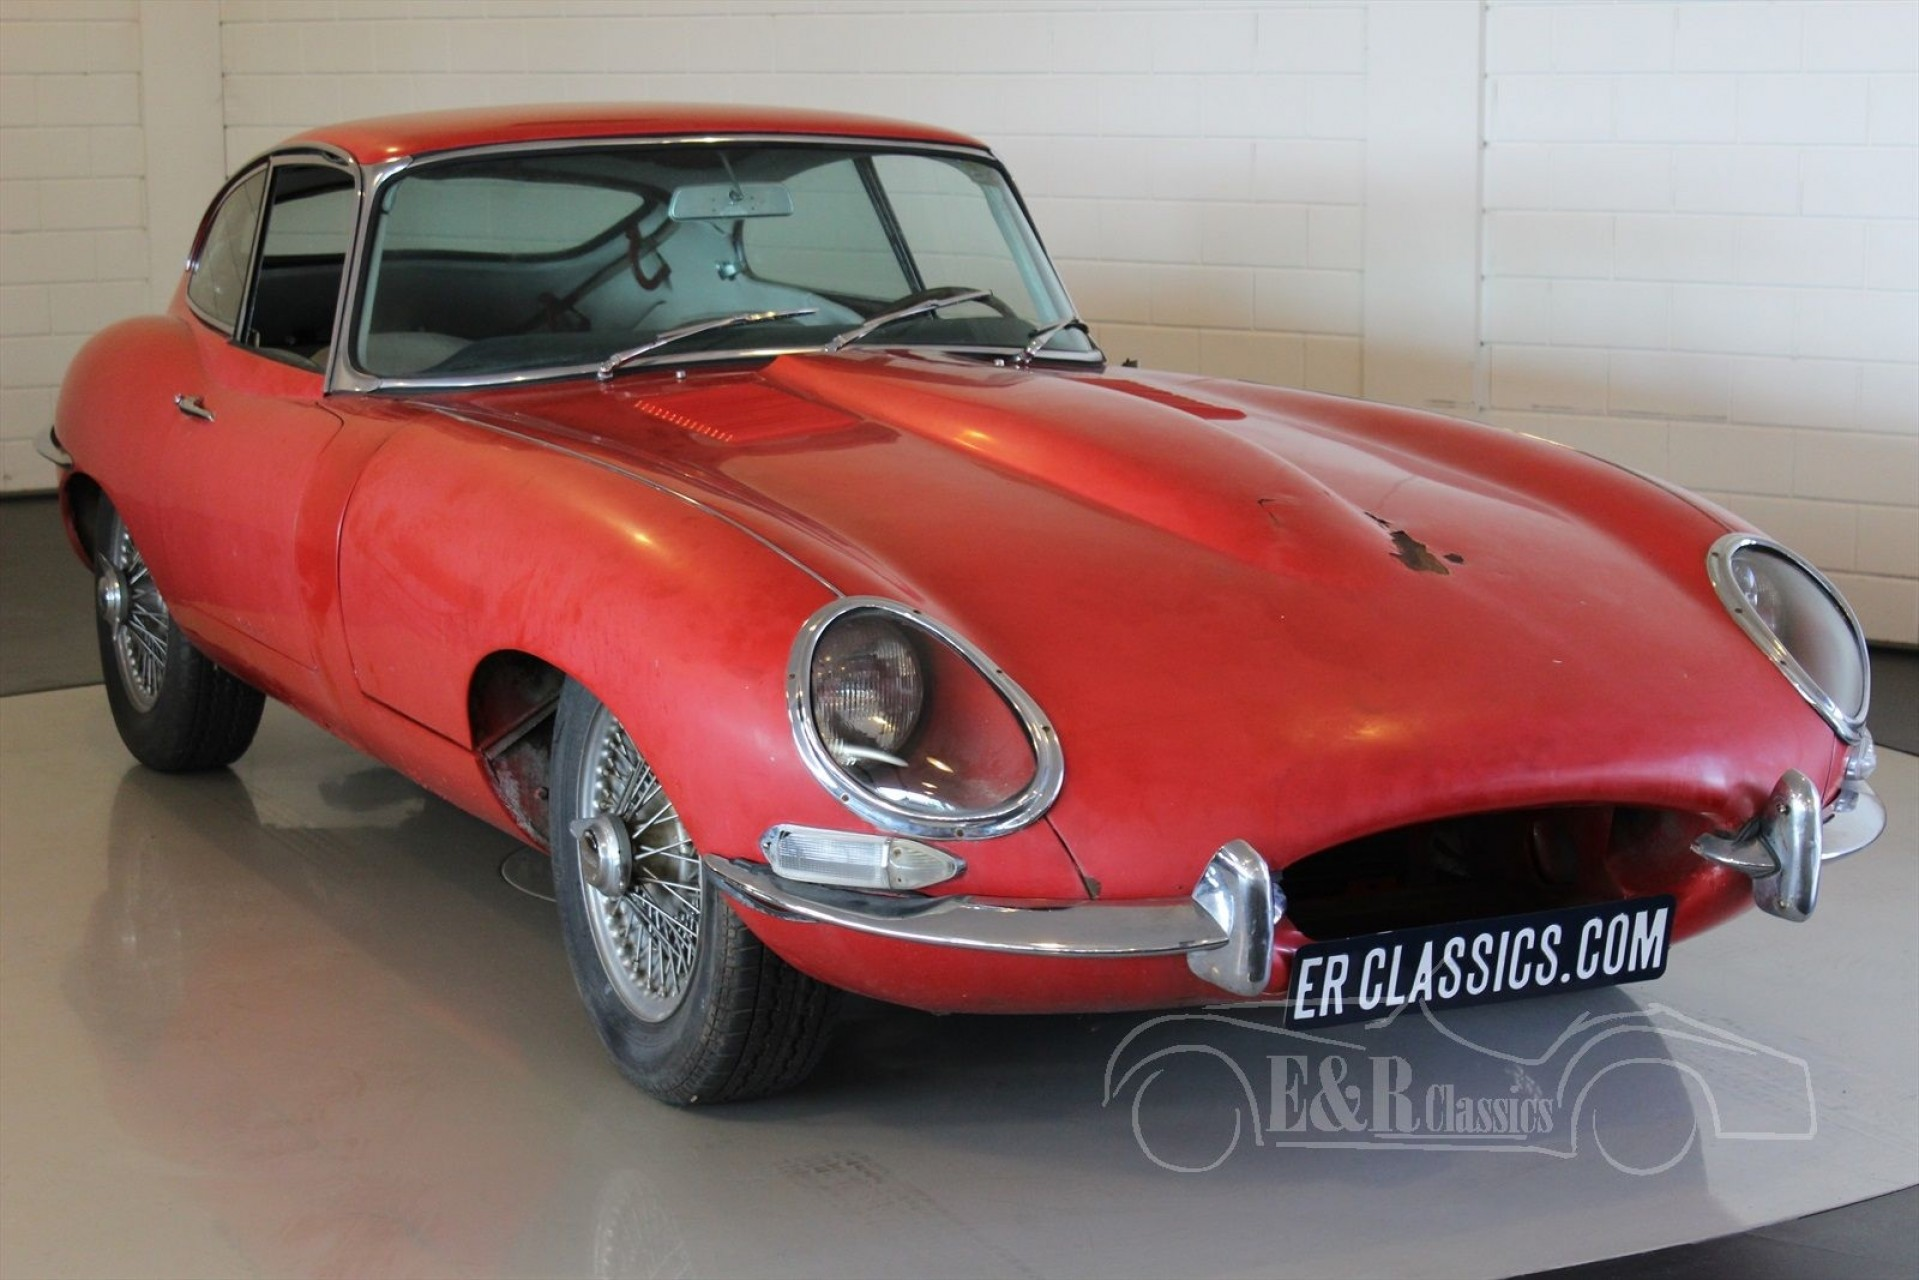 jaguar e type series 1 coupe 1962 for sale at erclassics. Black Bedroom Furniture Sets. Home Design Ideas